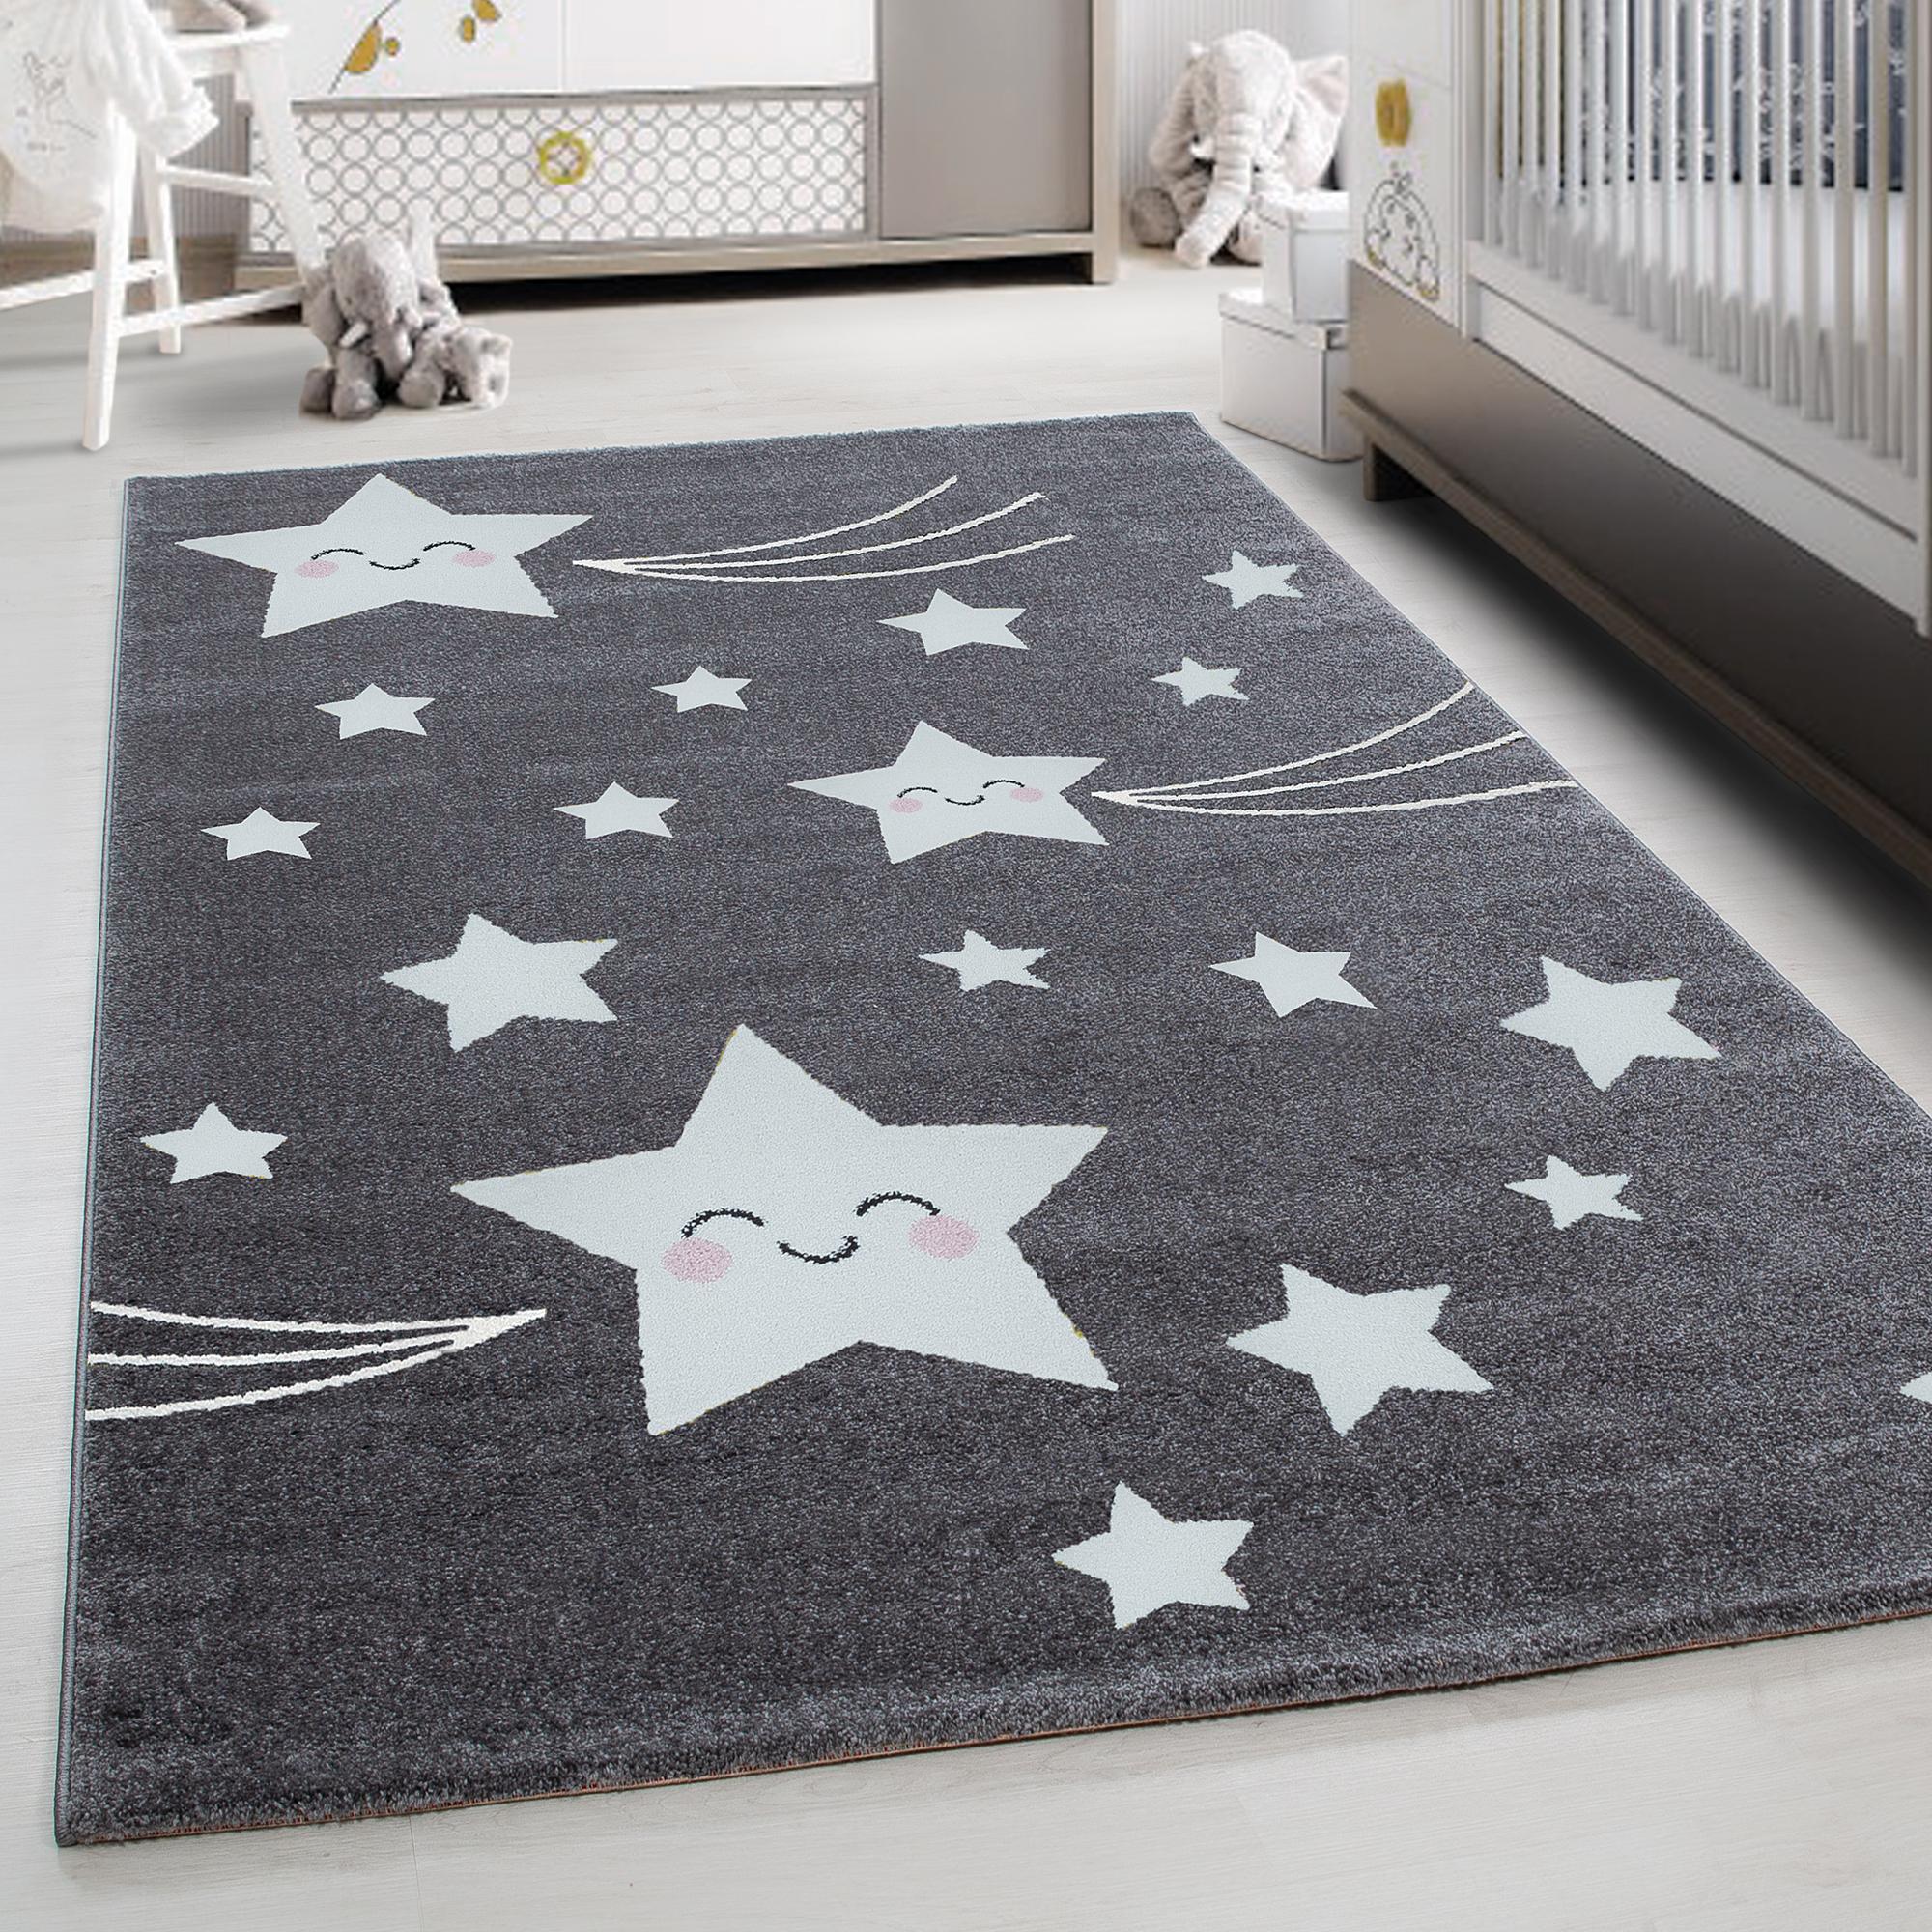 TEPPIUM Kids Play Mat rug Baby Room Carpet with Stars Grey carpet  Ceres  Webshop